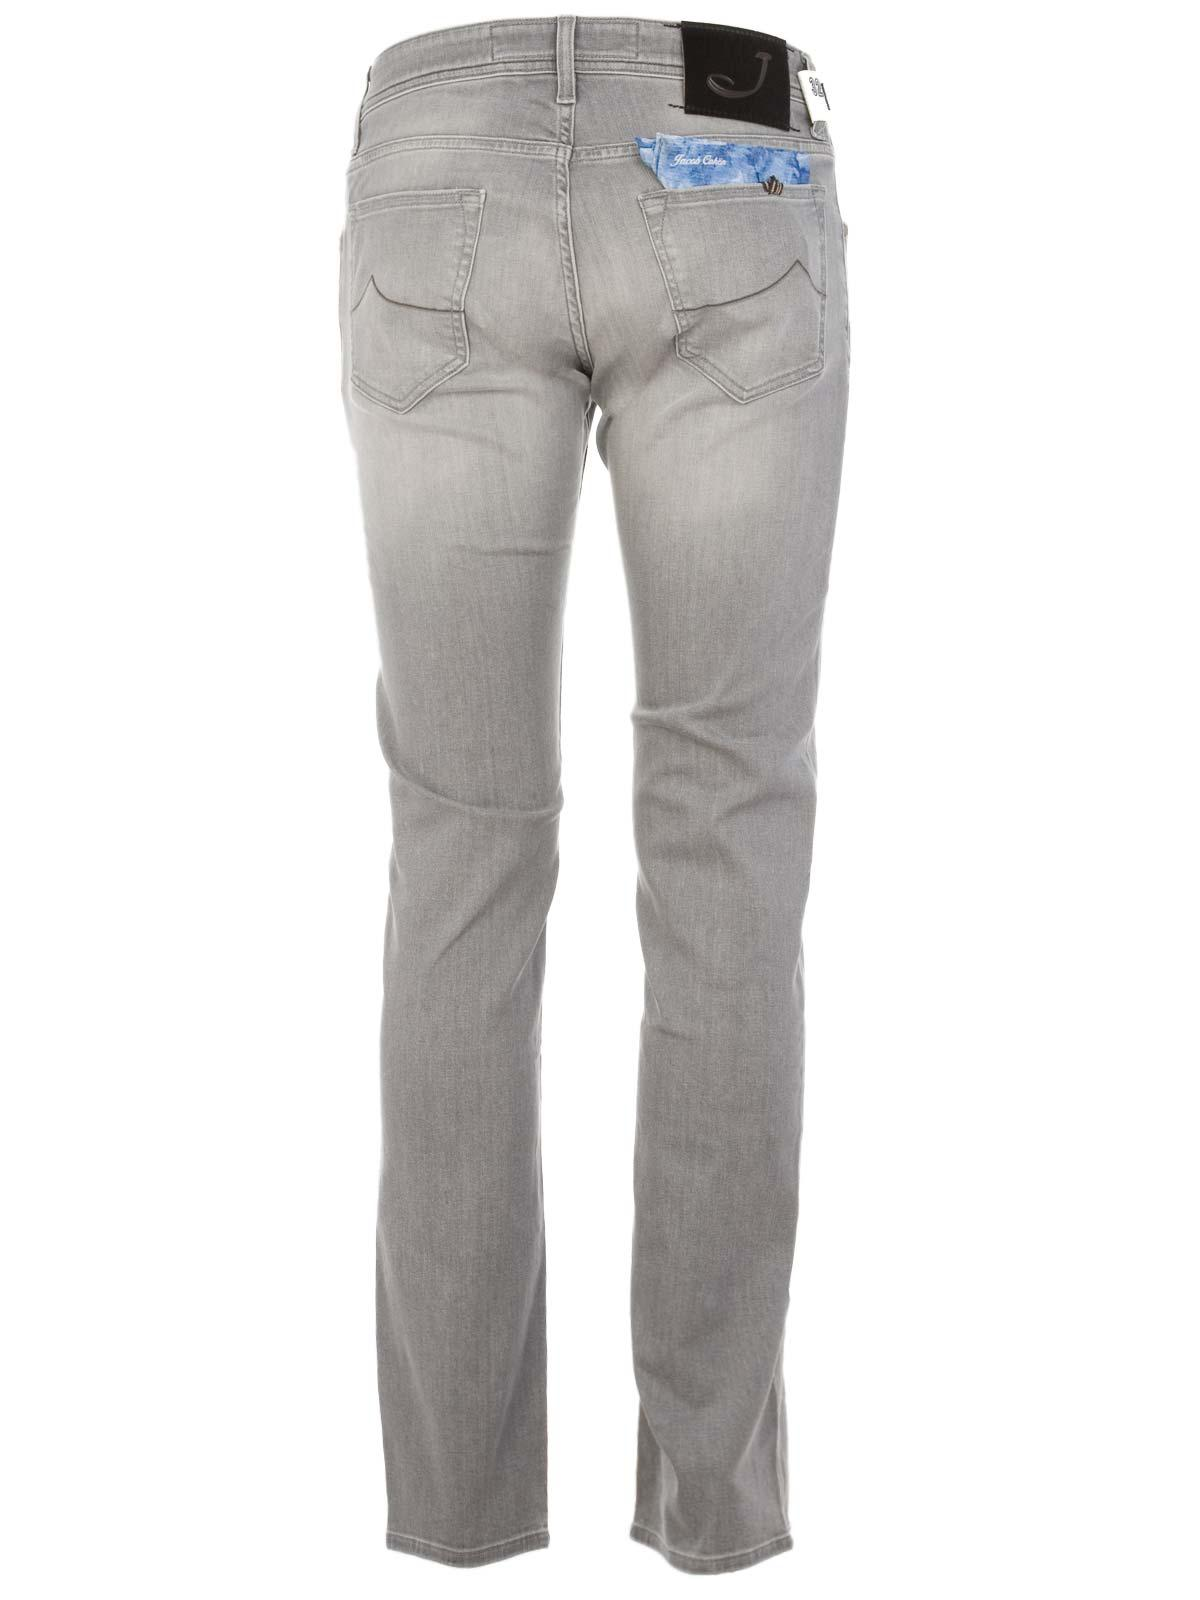 Jacob Cohen Denim Jeans in w3 (Grey)